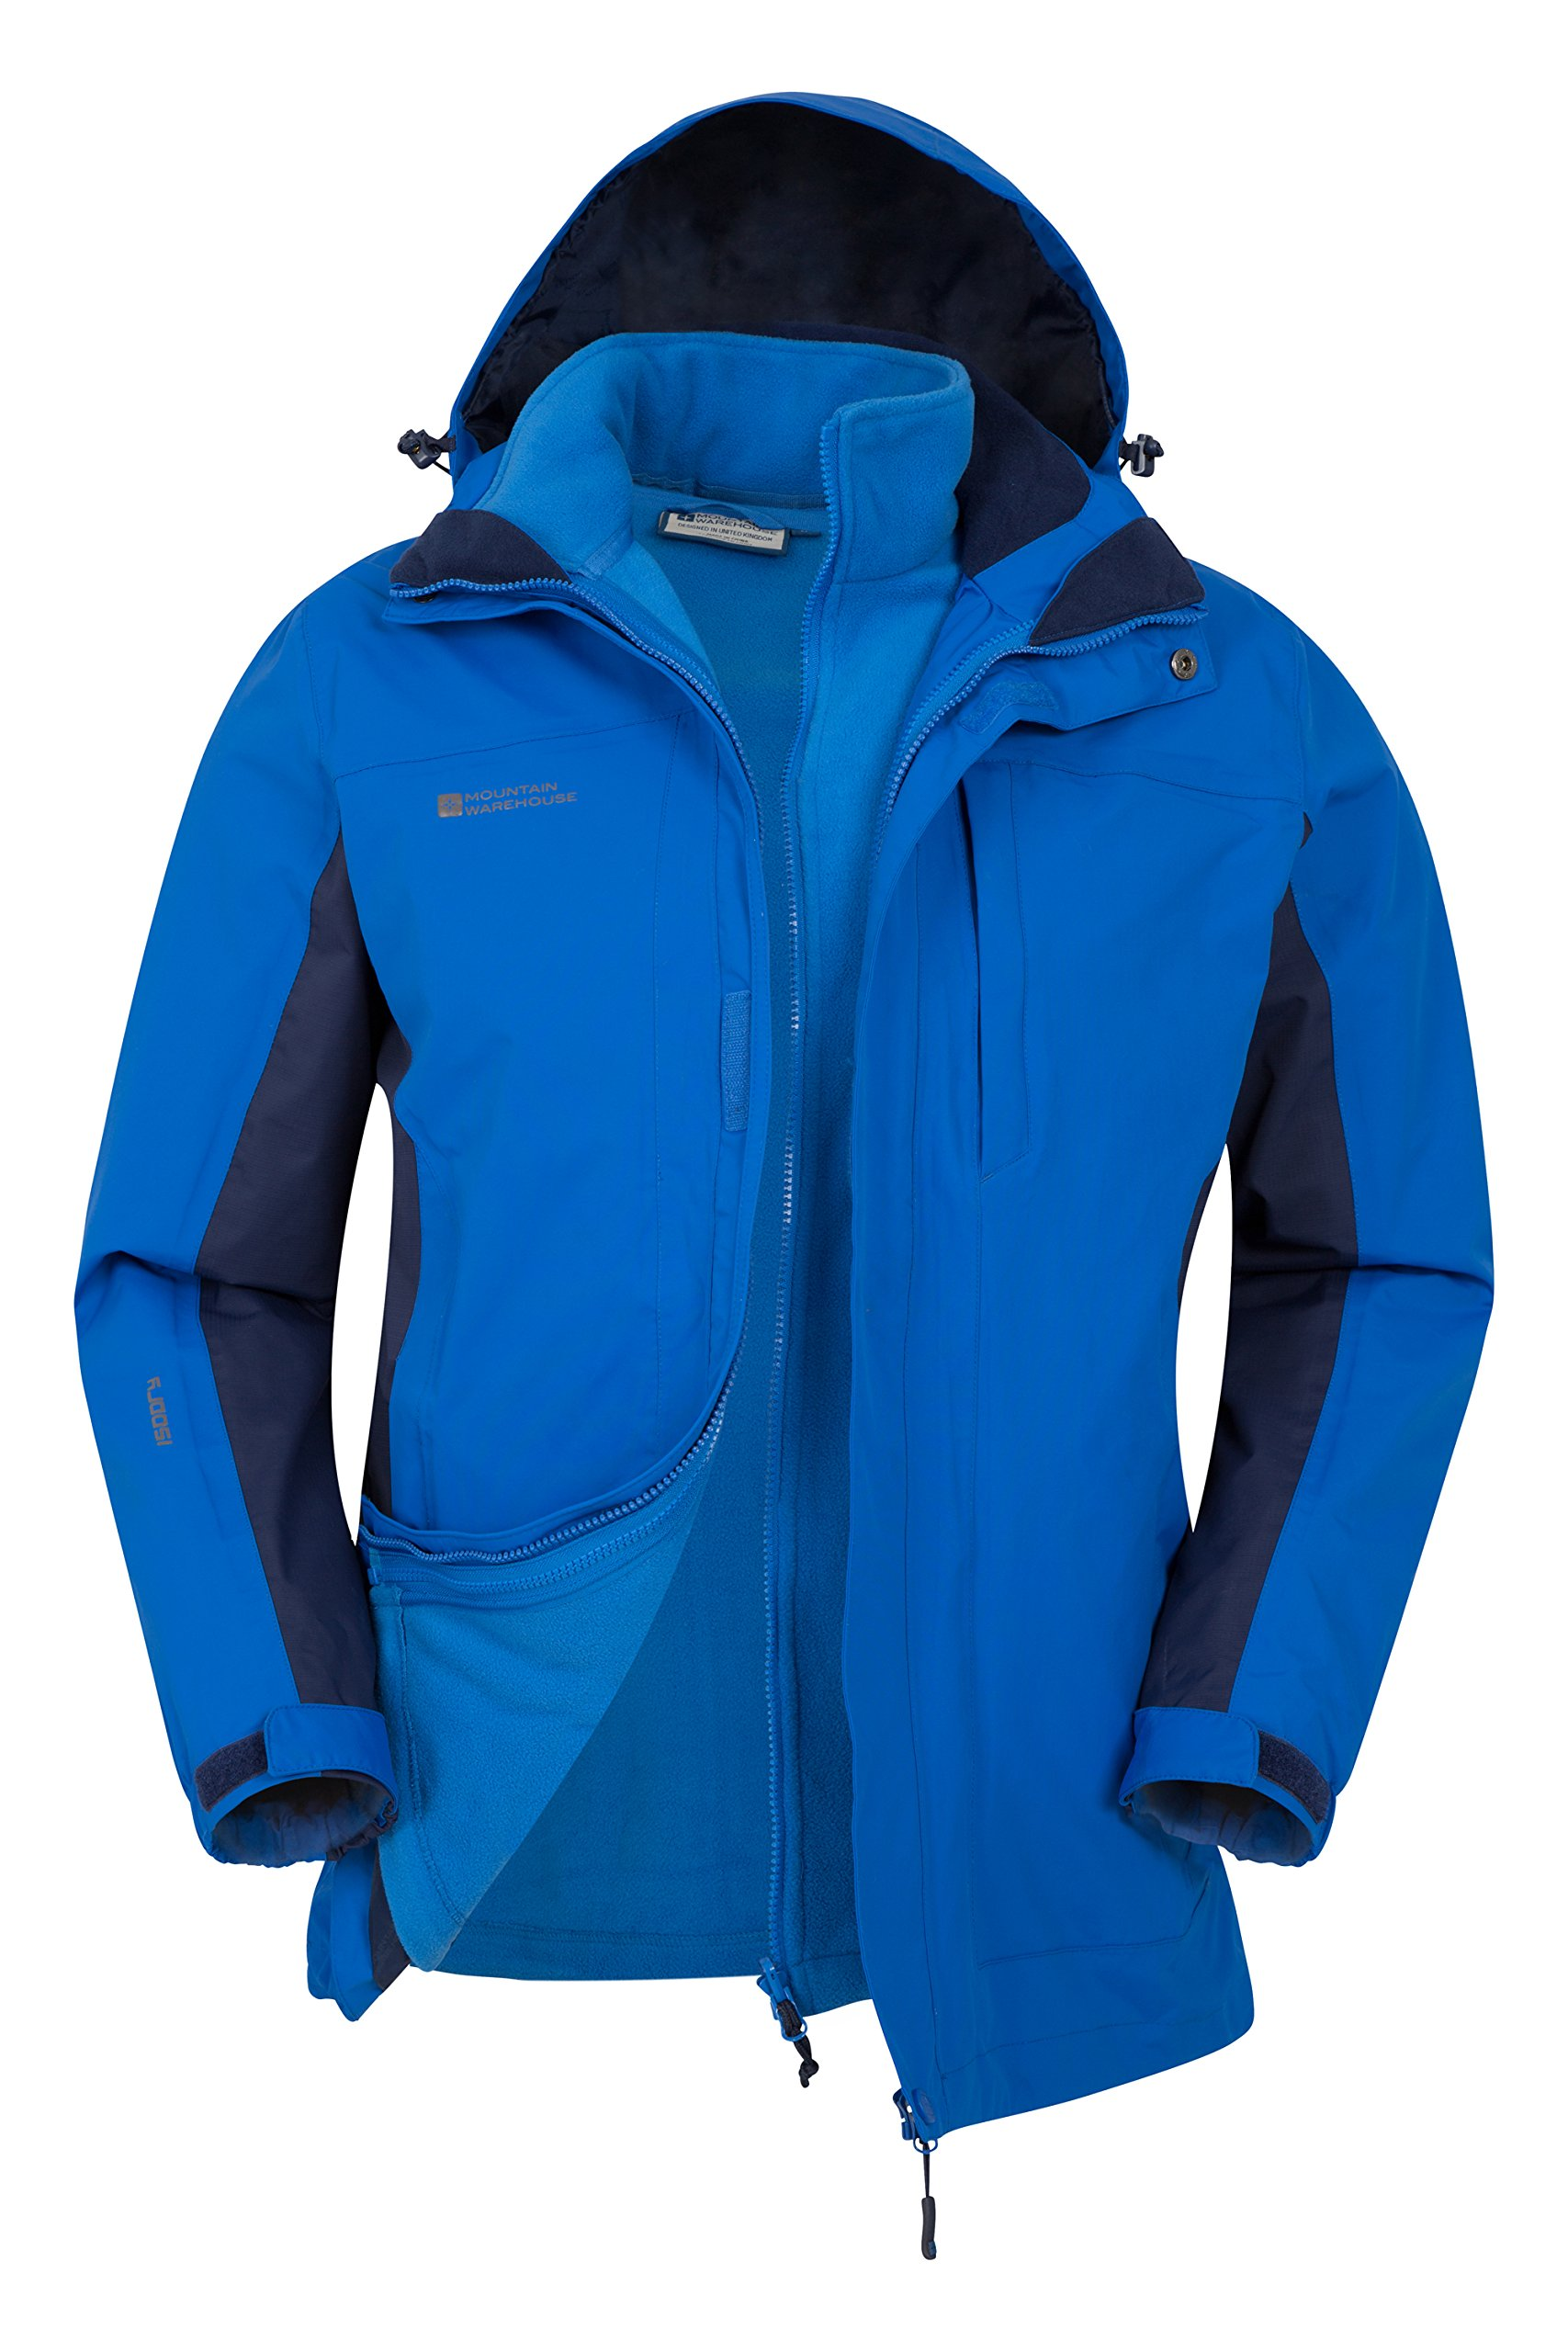 Mountain Warehouse Thunderstorm Mens 3 in 1 Jacket – Breathable Winter Mens Coat, Waterproof Rain Coat, Taped Seams…